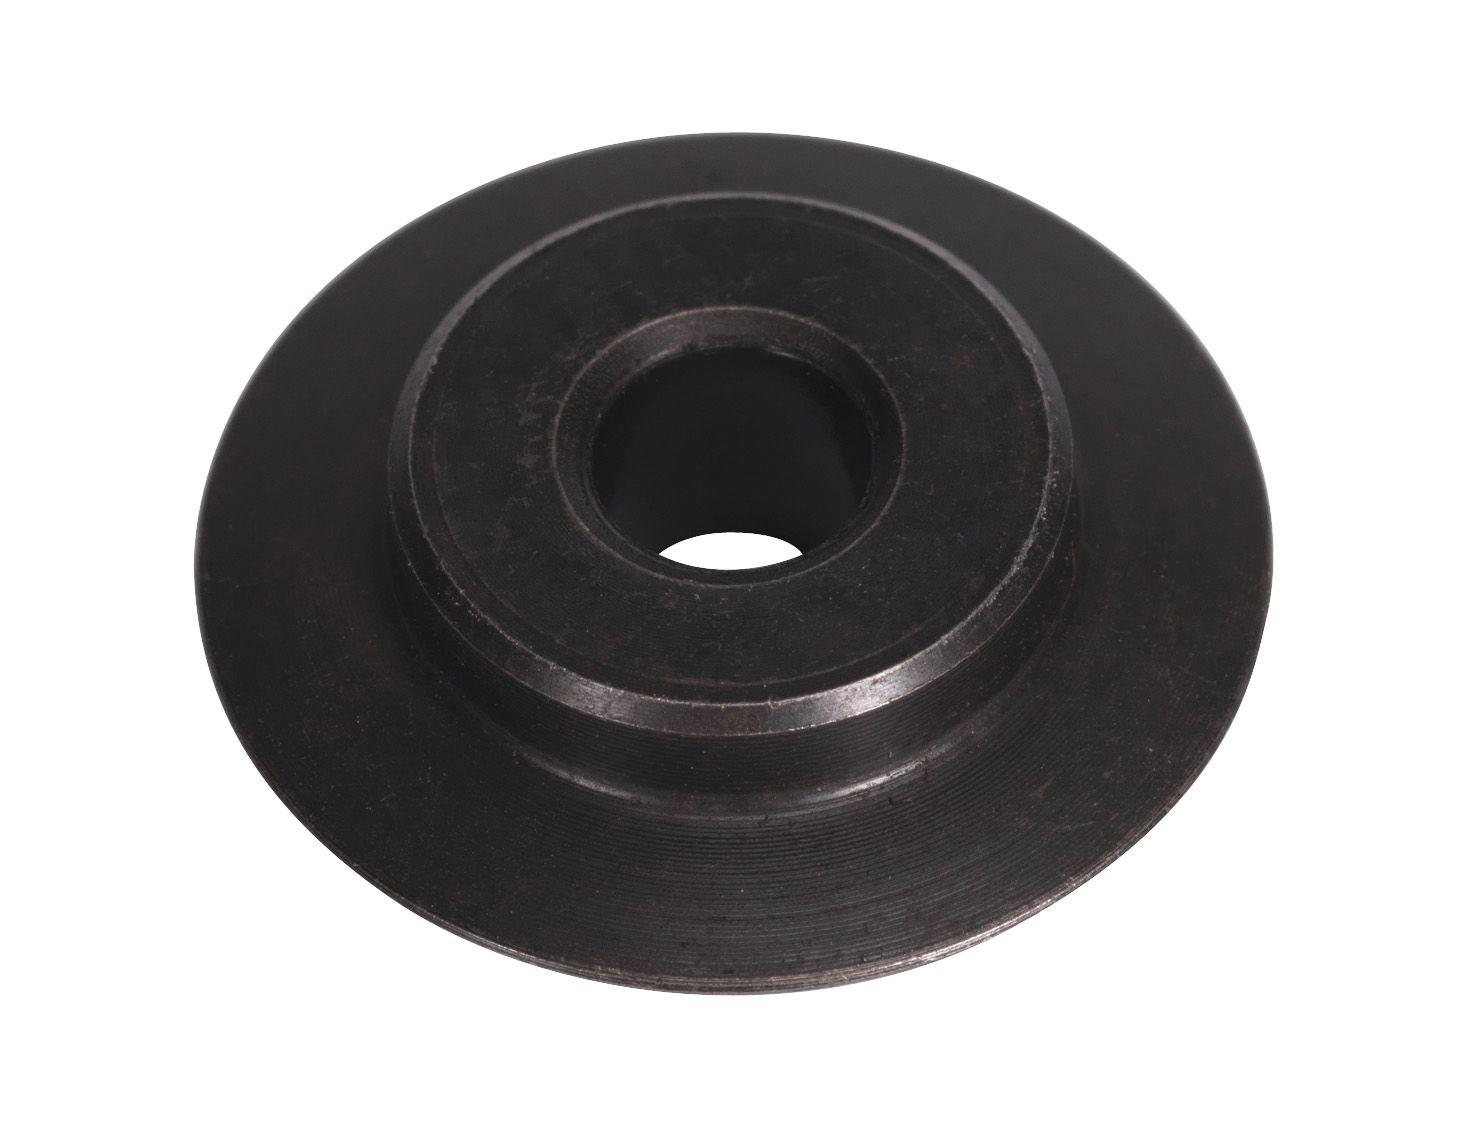 Sealey Cutting Wheel for VS16371